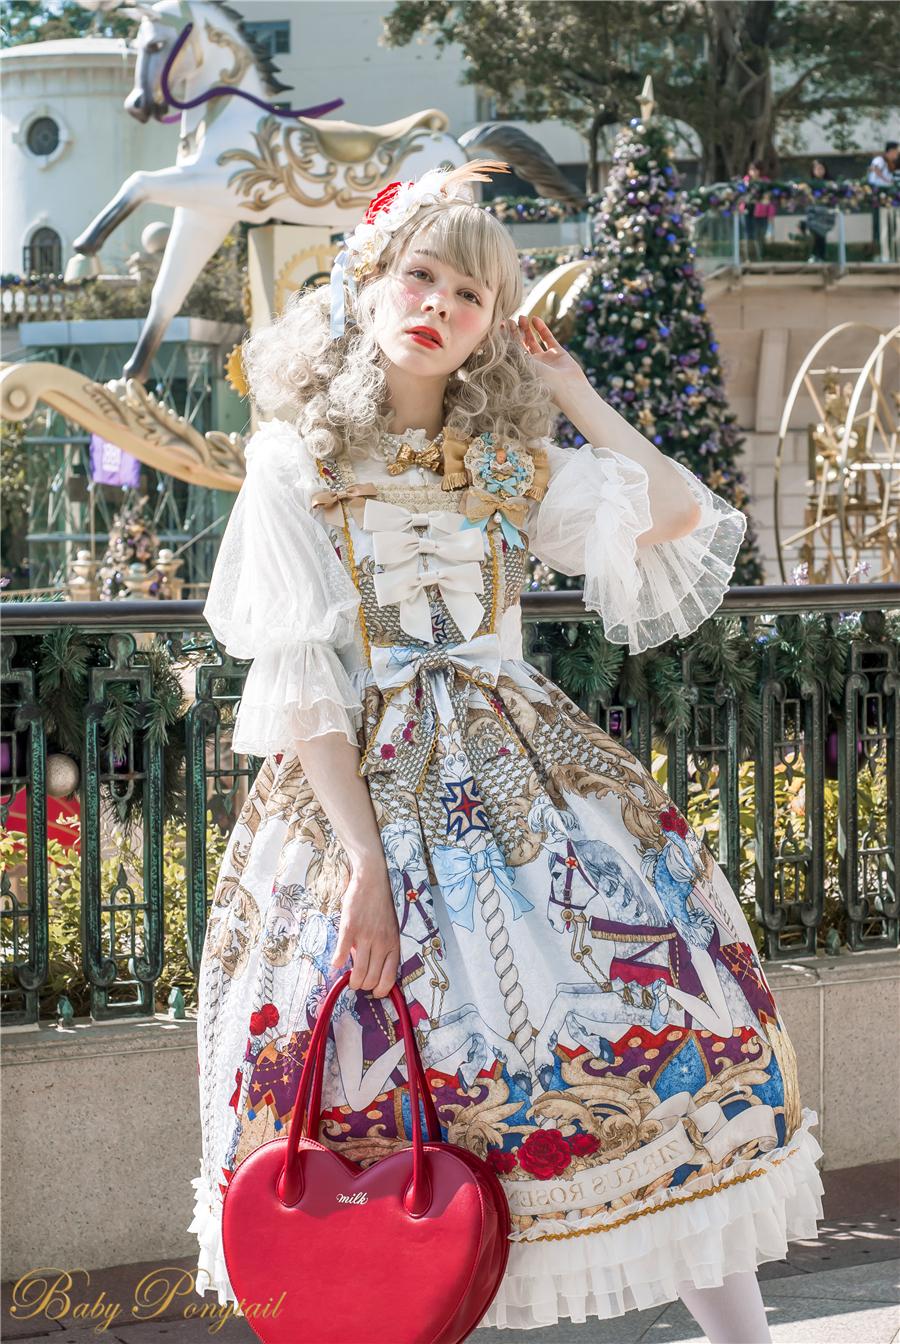 Baby Ponytail_Circus Princess_Silver JSK_Claudia05.jpg